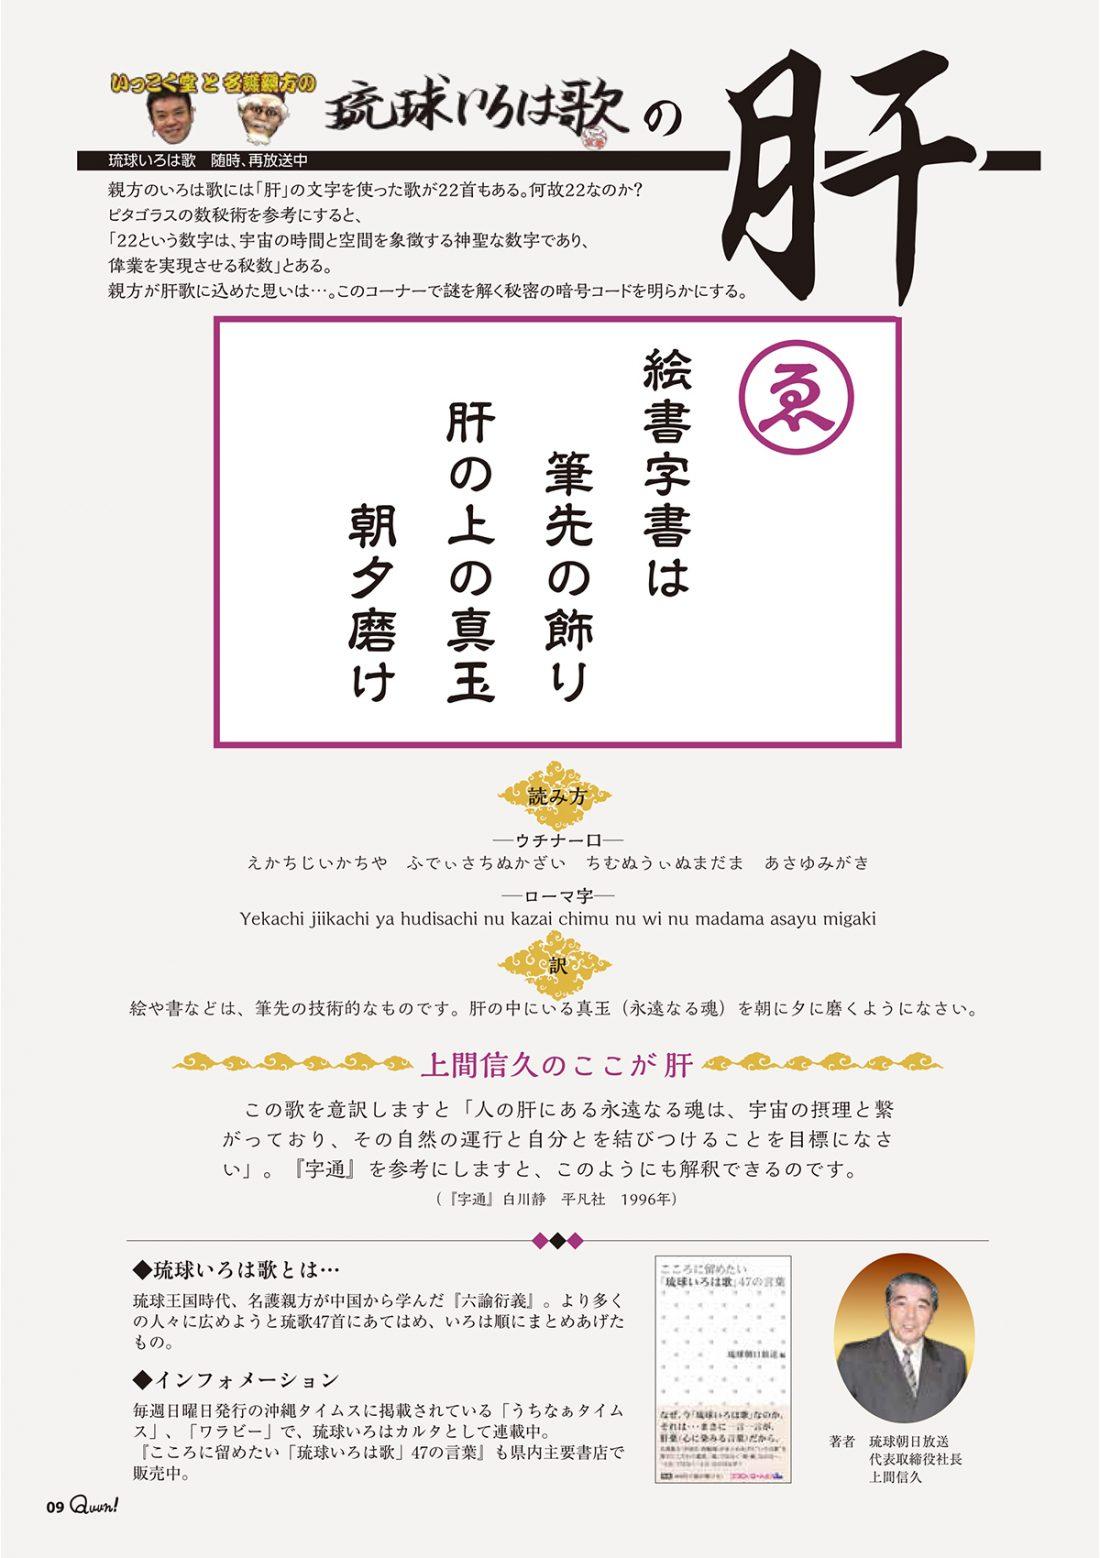 http://www.qab.co.jp/qgoro/wp-content/uploads/quun_0111-1100x1558.jpg